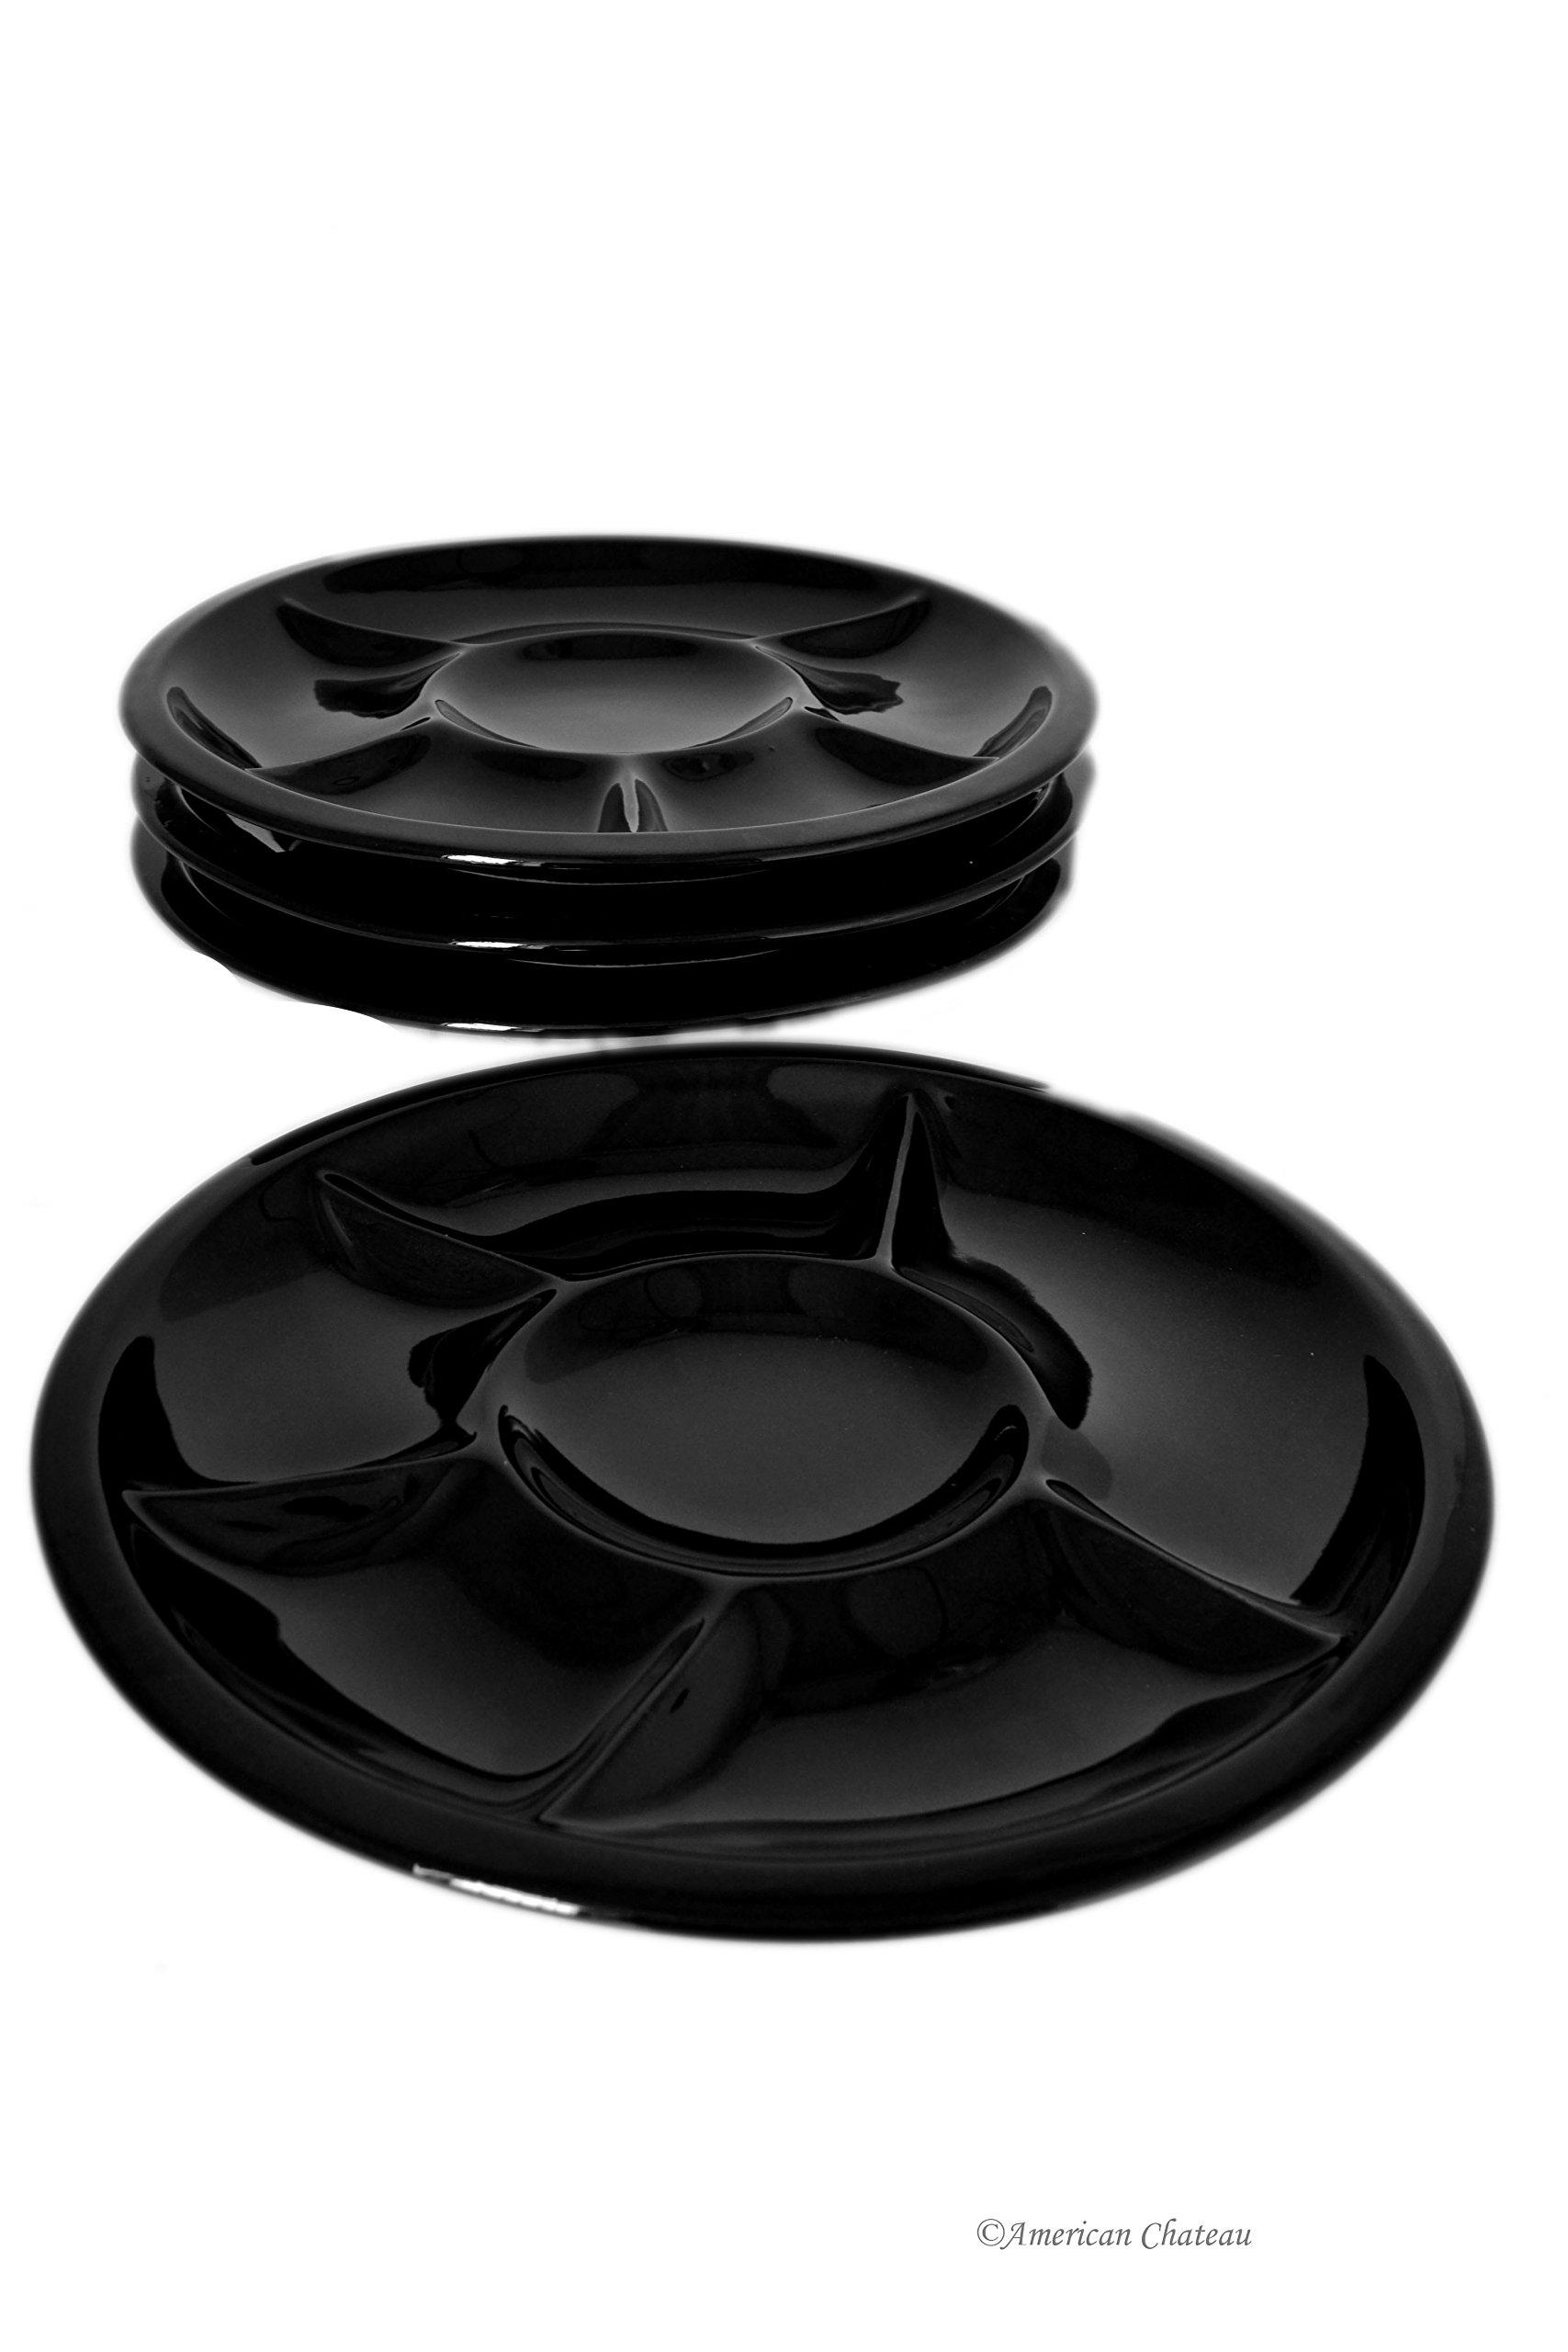 Set of 12 Divided Black Porcelain Fondue/Sushi/Buffet Plates